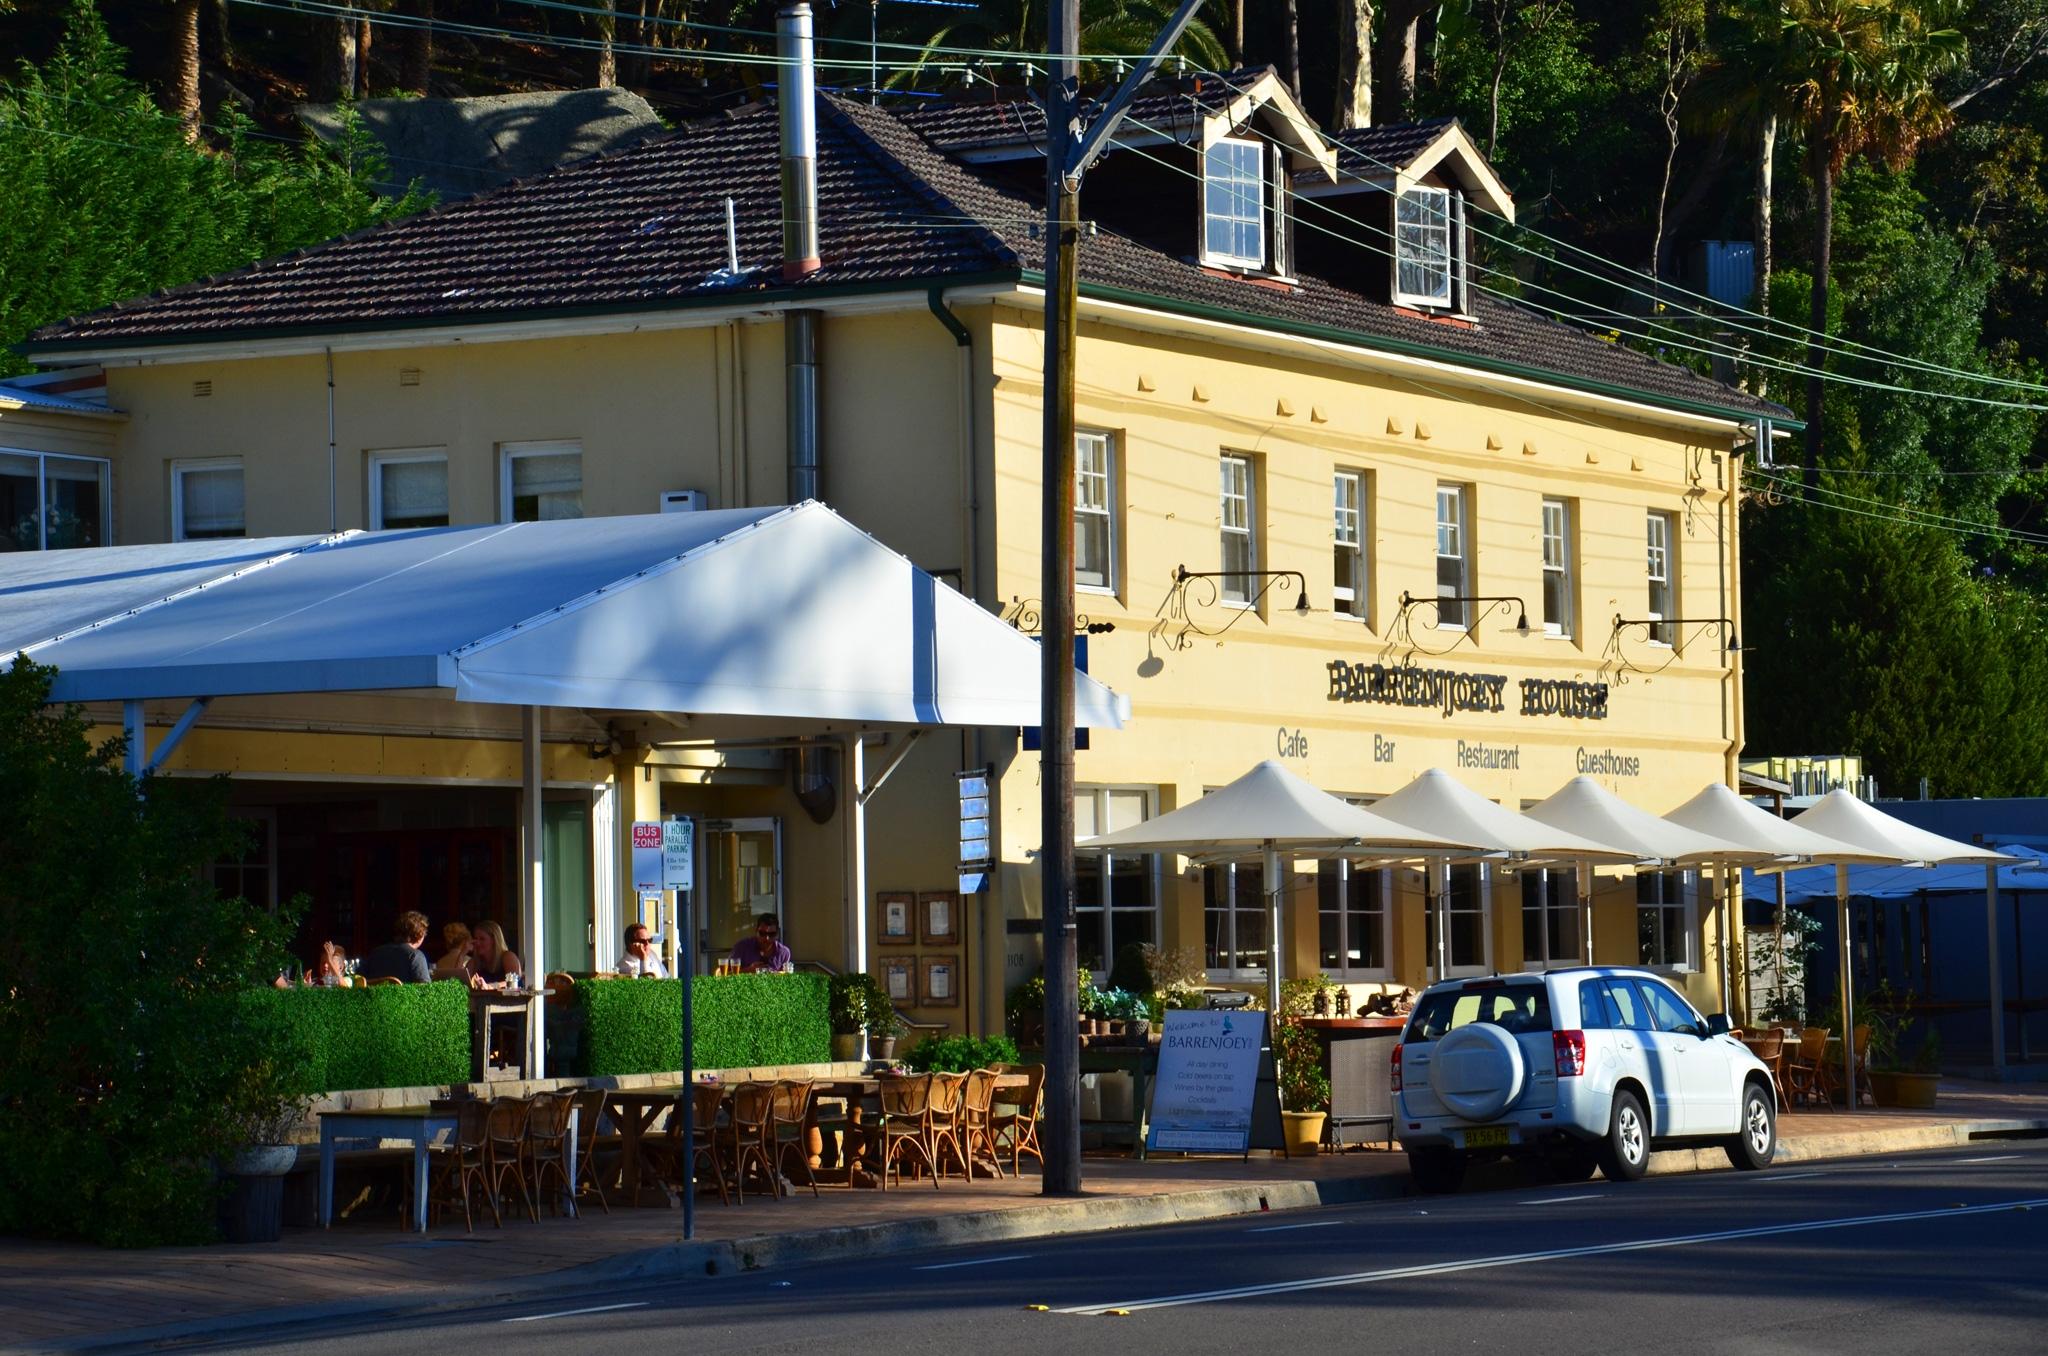 Barrenjoey - Image ©2014 ManlyAustralia.com